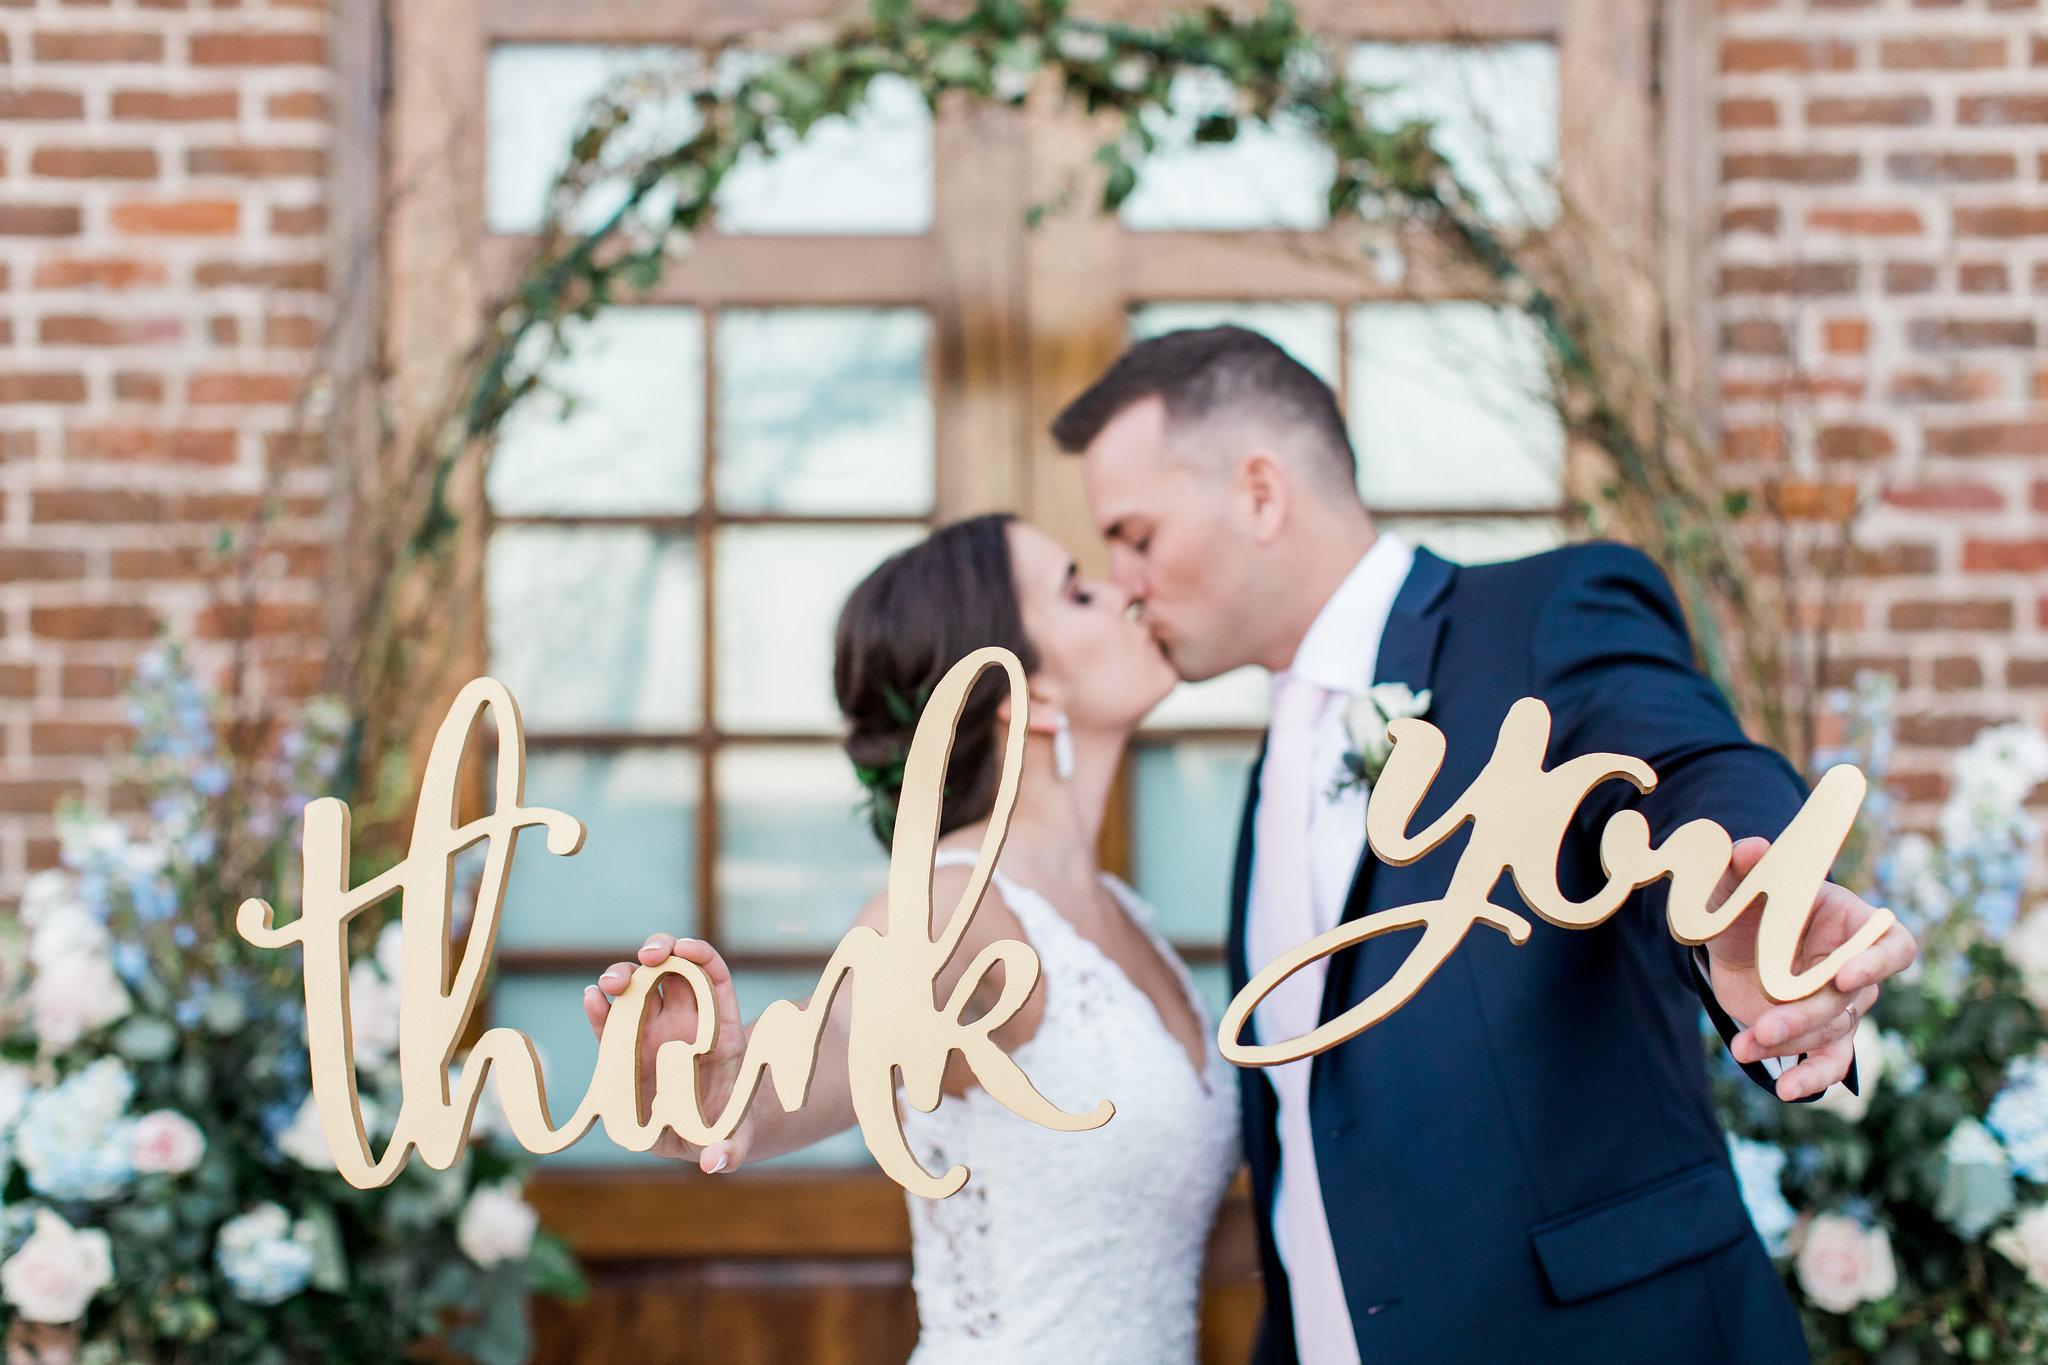 apt-b-photography-Savannah-wedding-photographer-savannah-engagement-photographer-historic-savannah-engagement-charles-h-morris-center-wedding-savannah-weddings-26.JPG